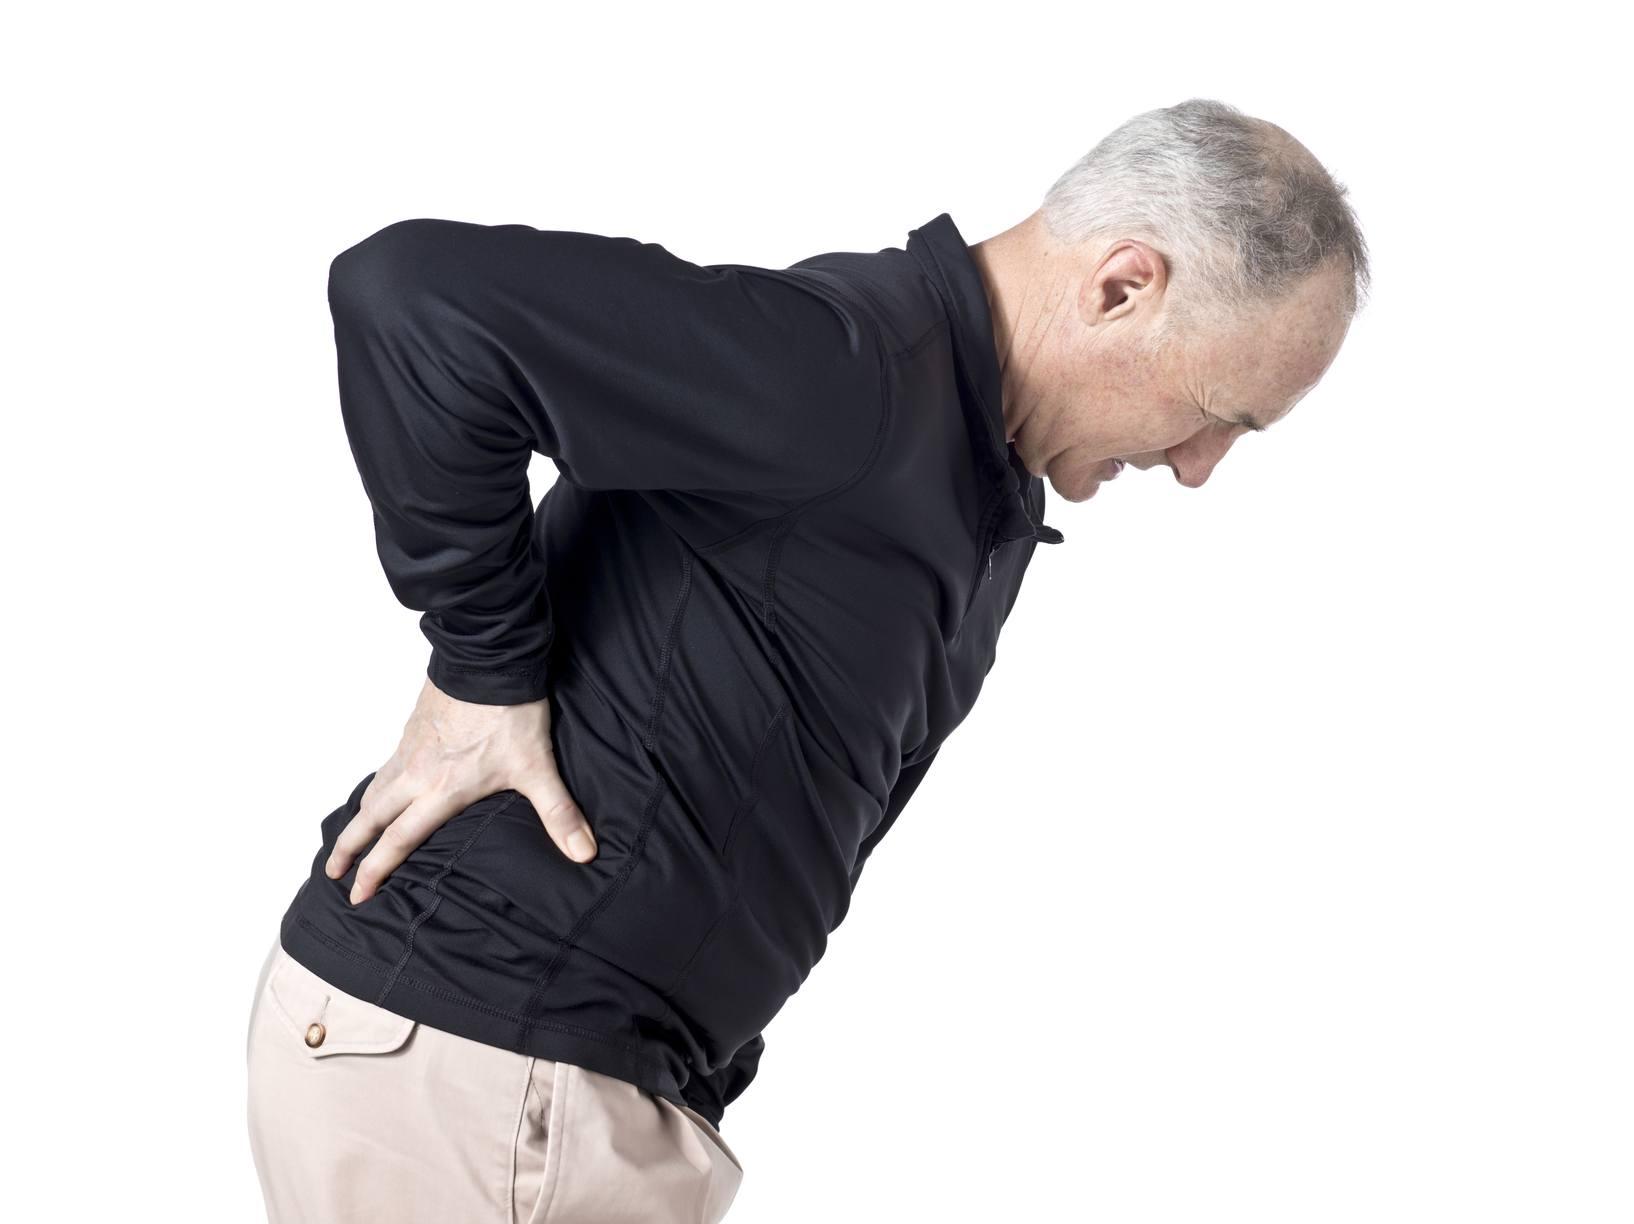 симптомы радикулопатии